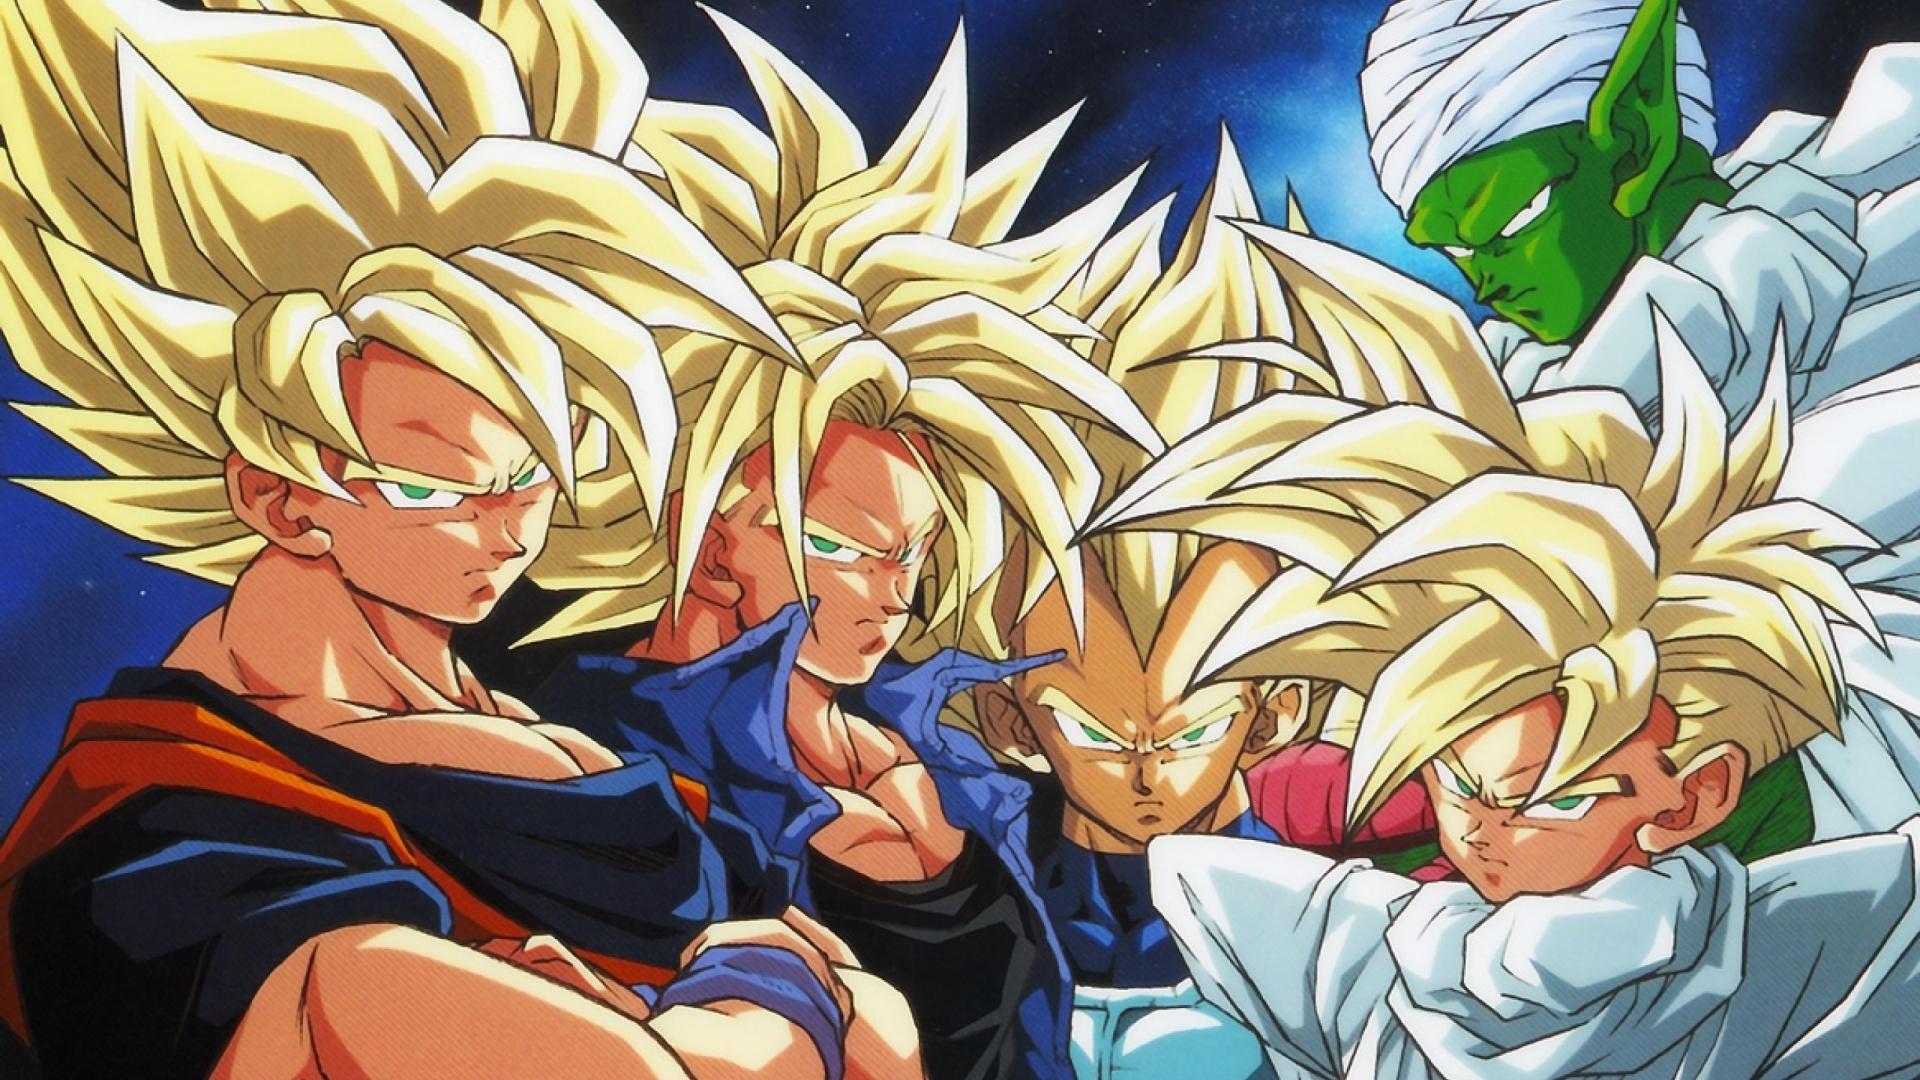 Dragon Ball Z Trunks Gallery 598254347 Wallpaper For Free New